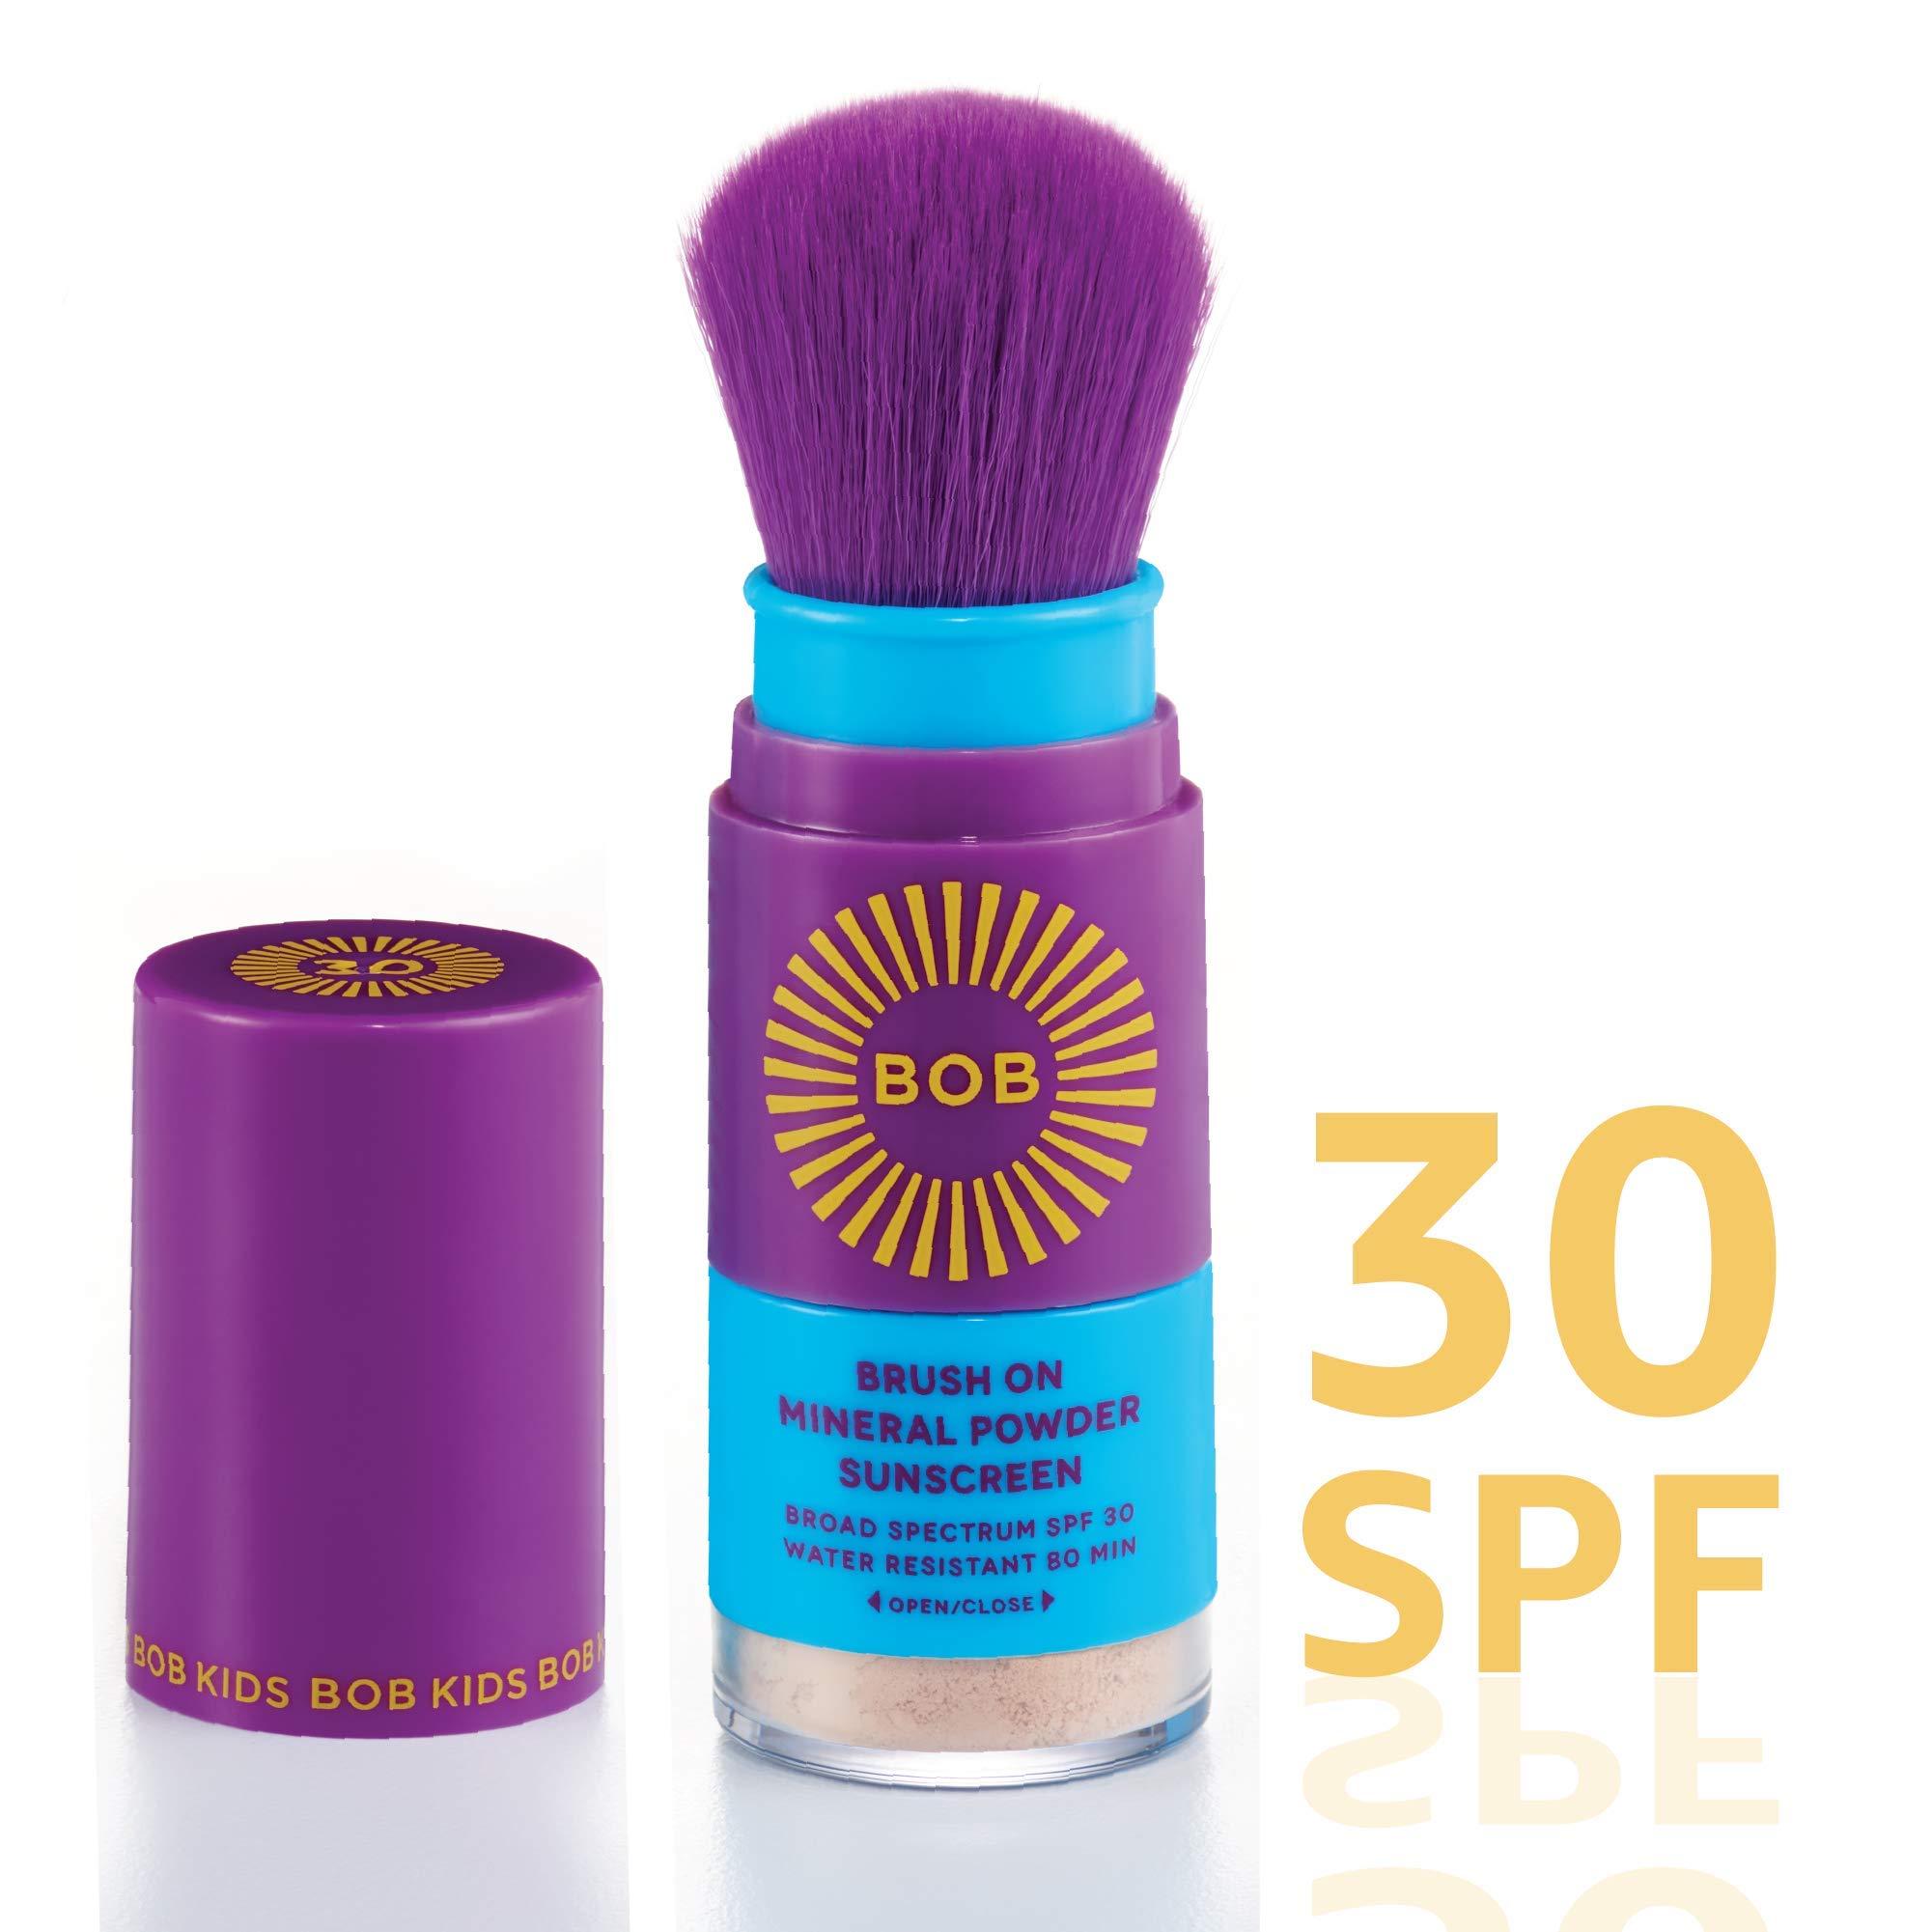 Brush Spectrum Mineral Powder Sunscreen